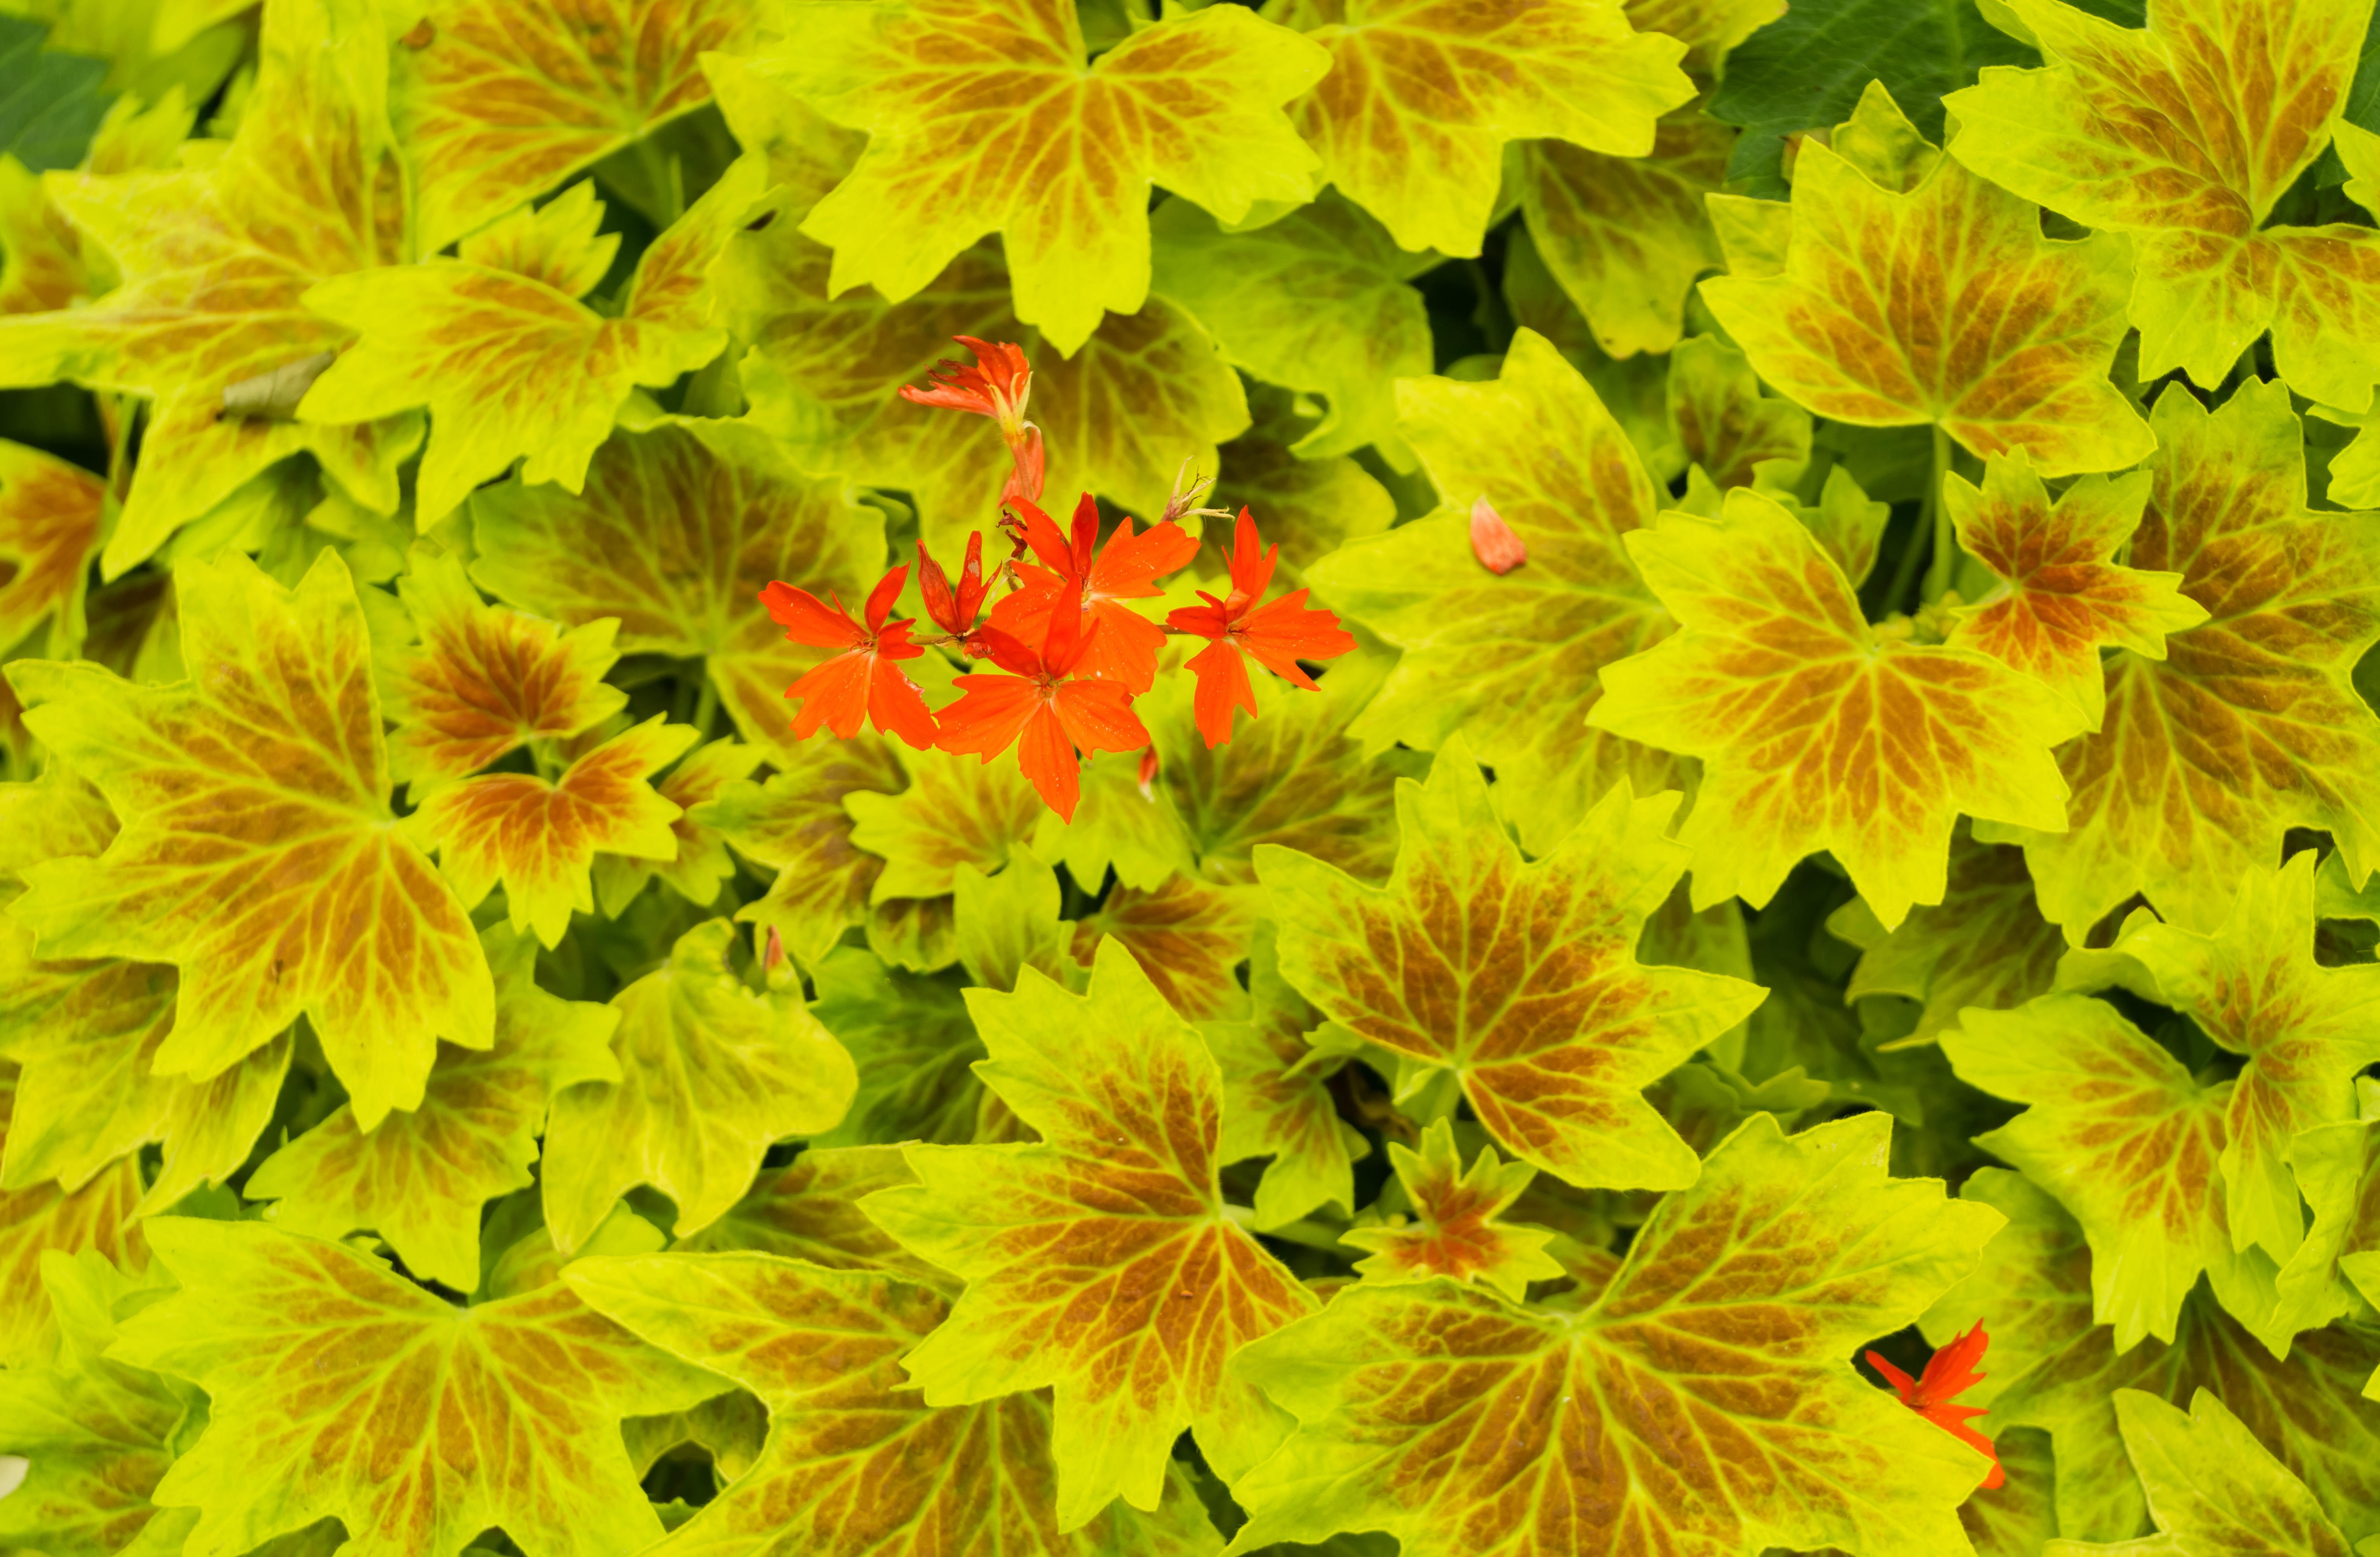 Wallpaper Plants Flowers Foliage Redflowers Yellow Red